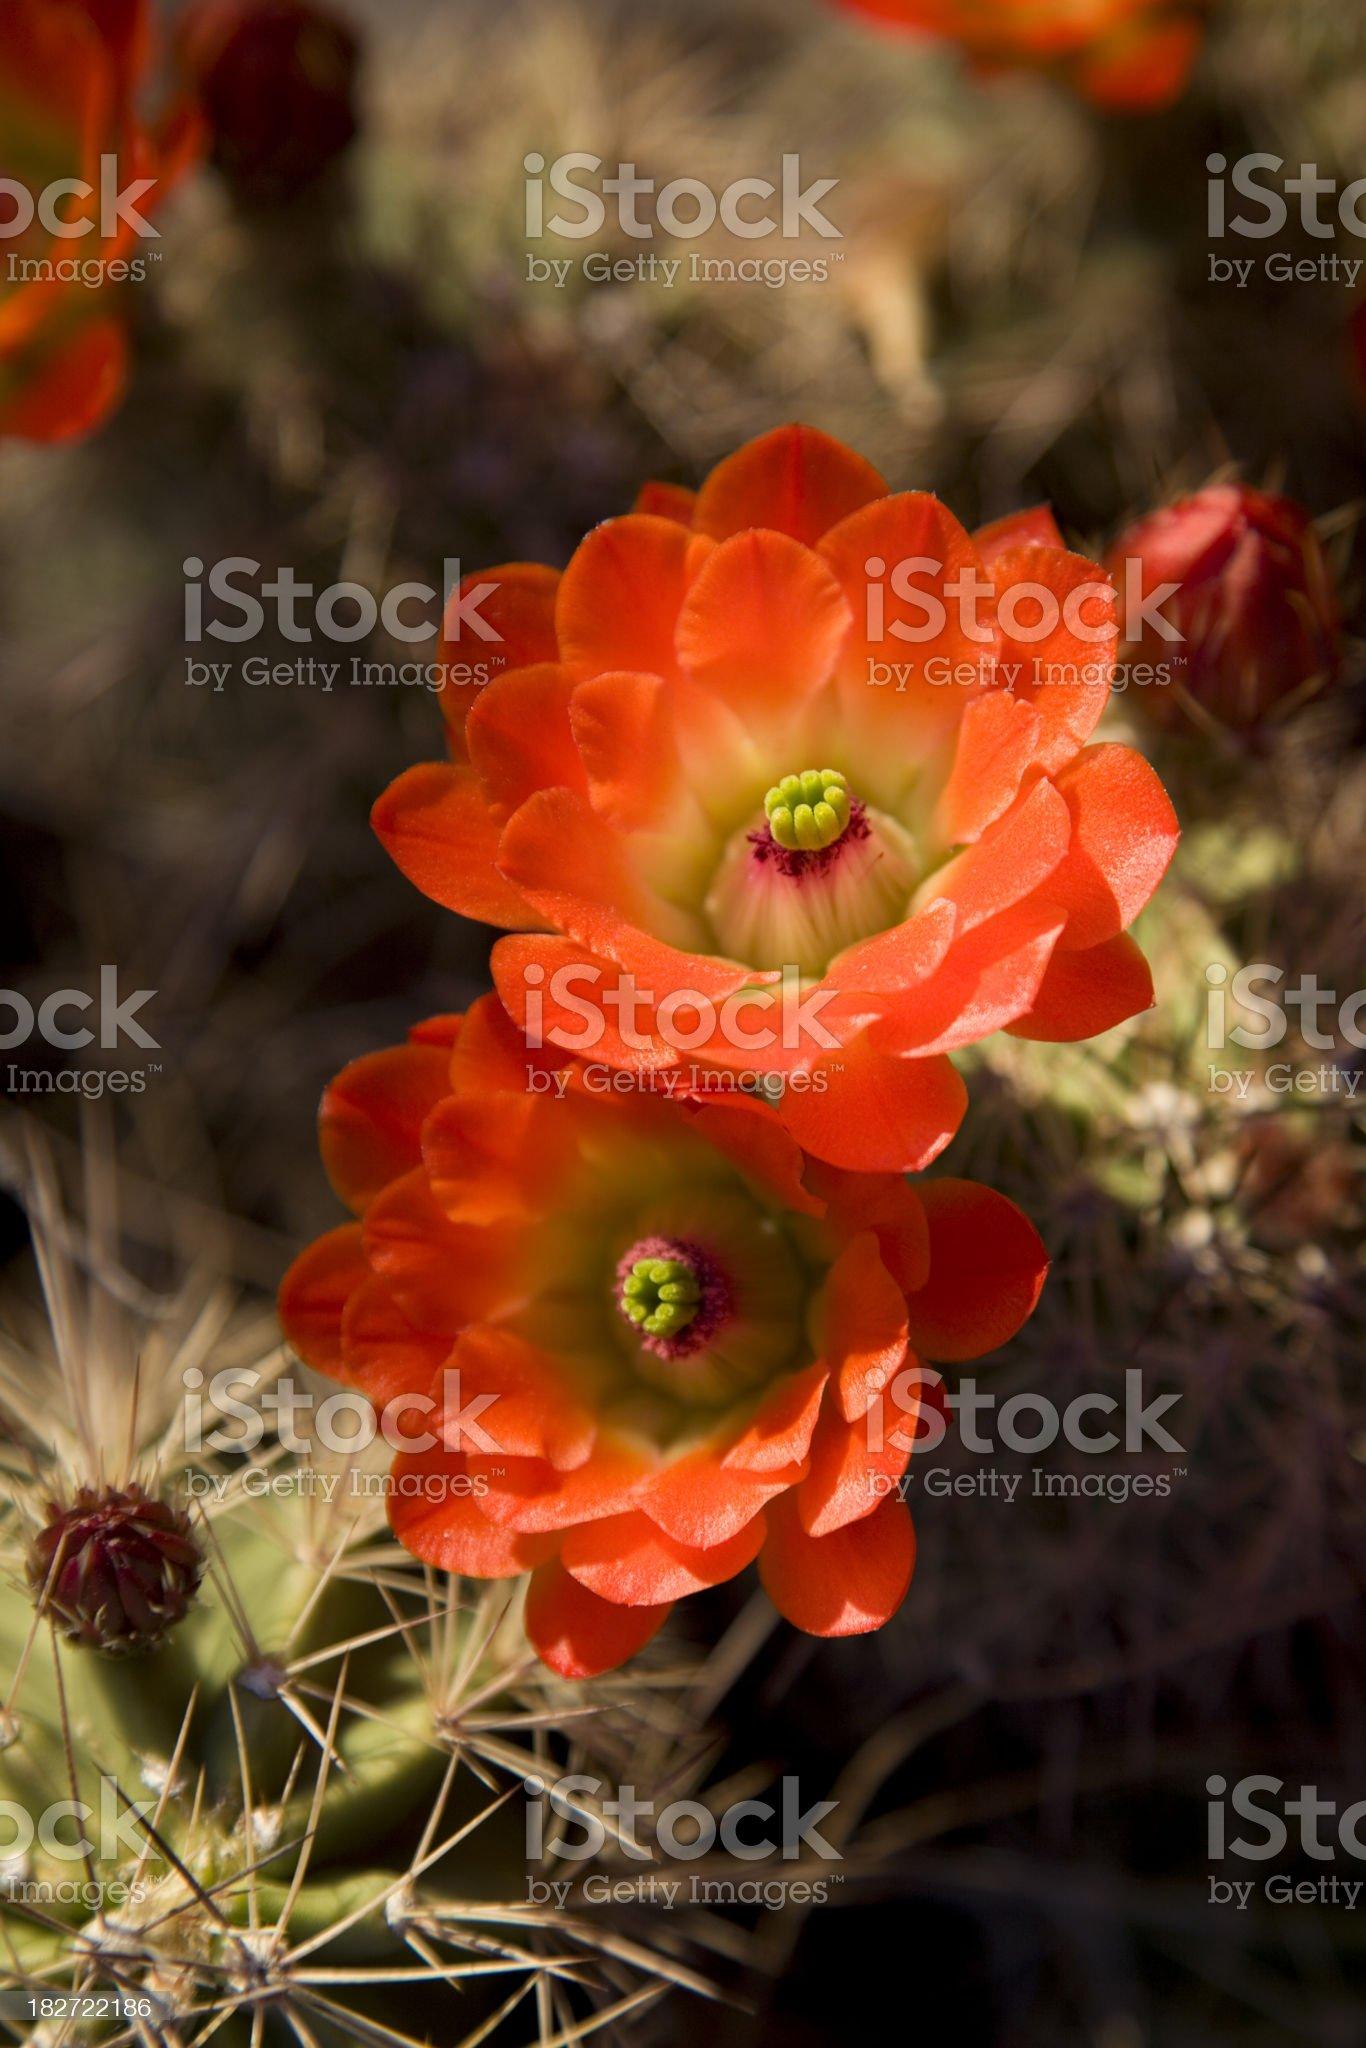 Pair of Bright Orange Cactus Flowers royalty-free stock photo